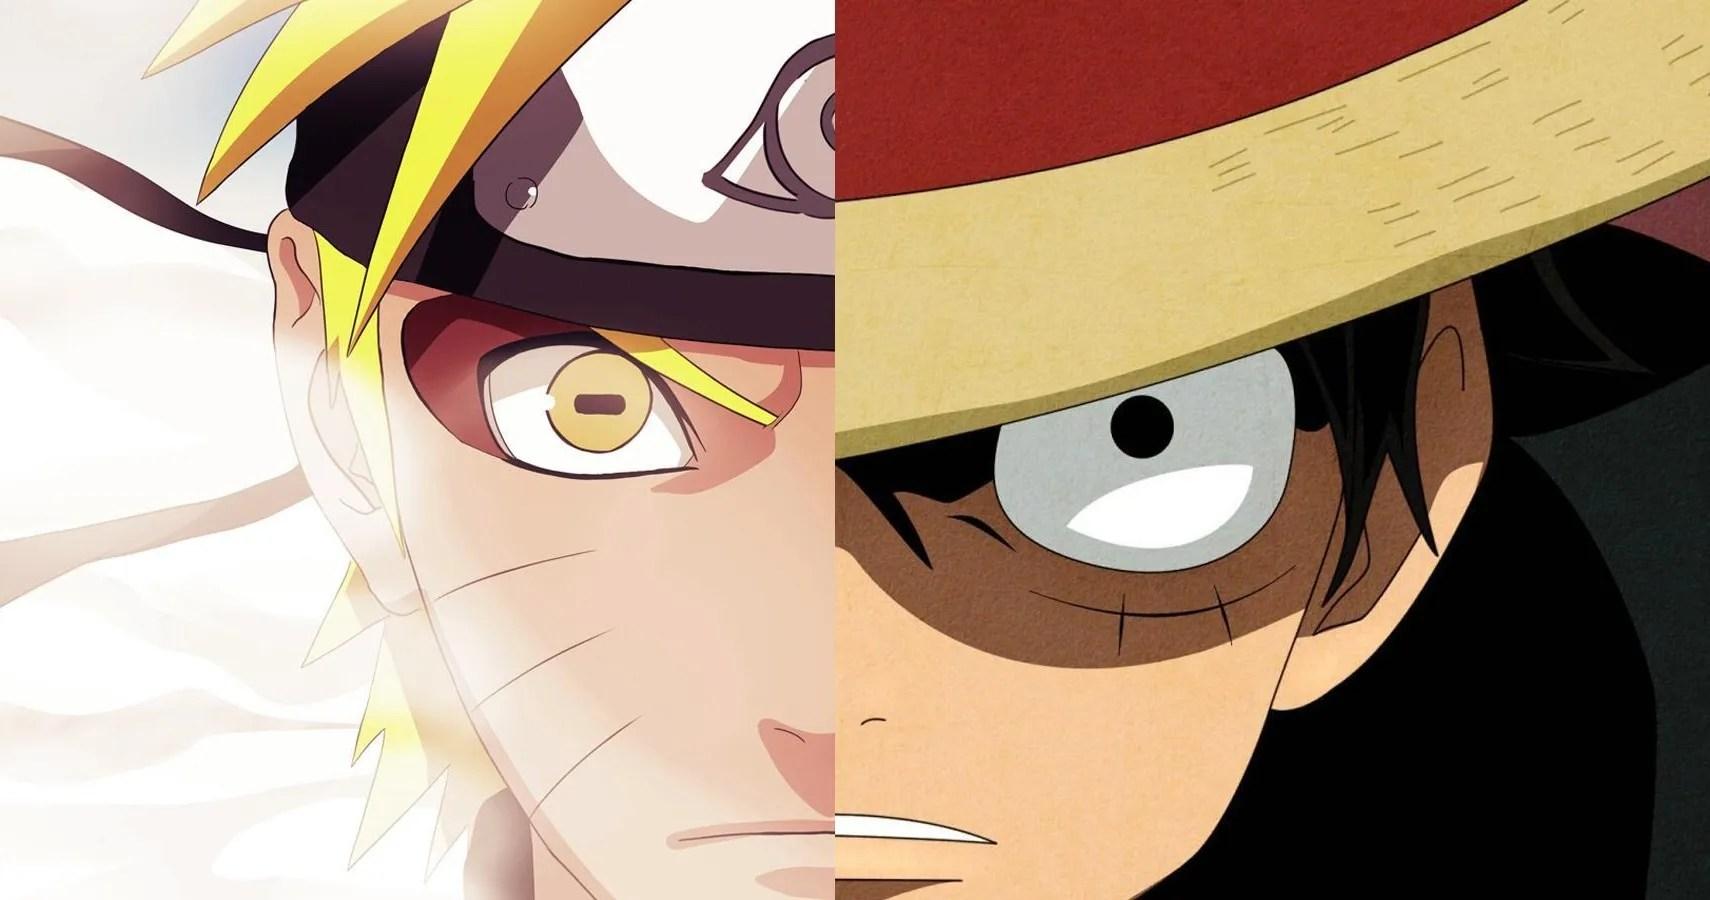 Biblia · biblia de estudo · biblia infantil · one piece volume 1 · etica e enfermagem · manga naruto · livros, revistas e comics. Naruto Vs Luffy Who Would Win In The Shonen Showdown Cbr